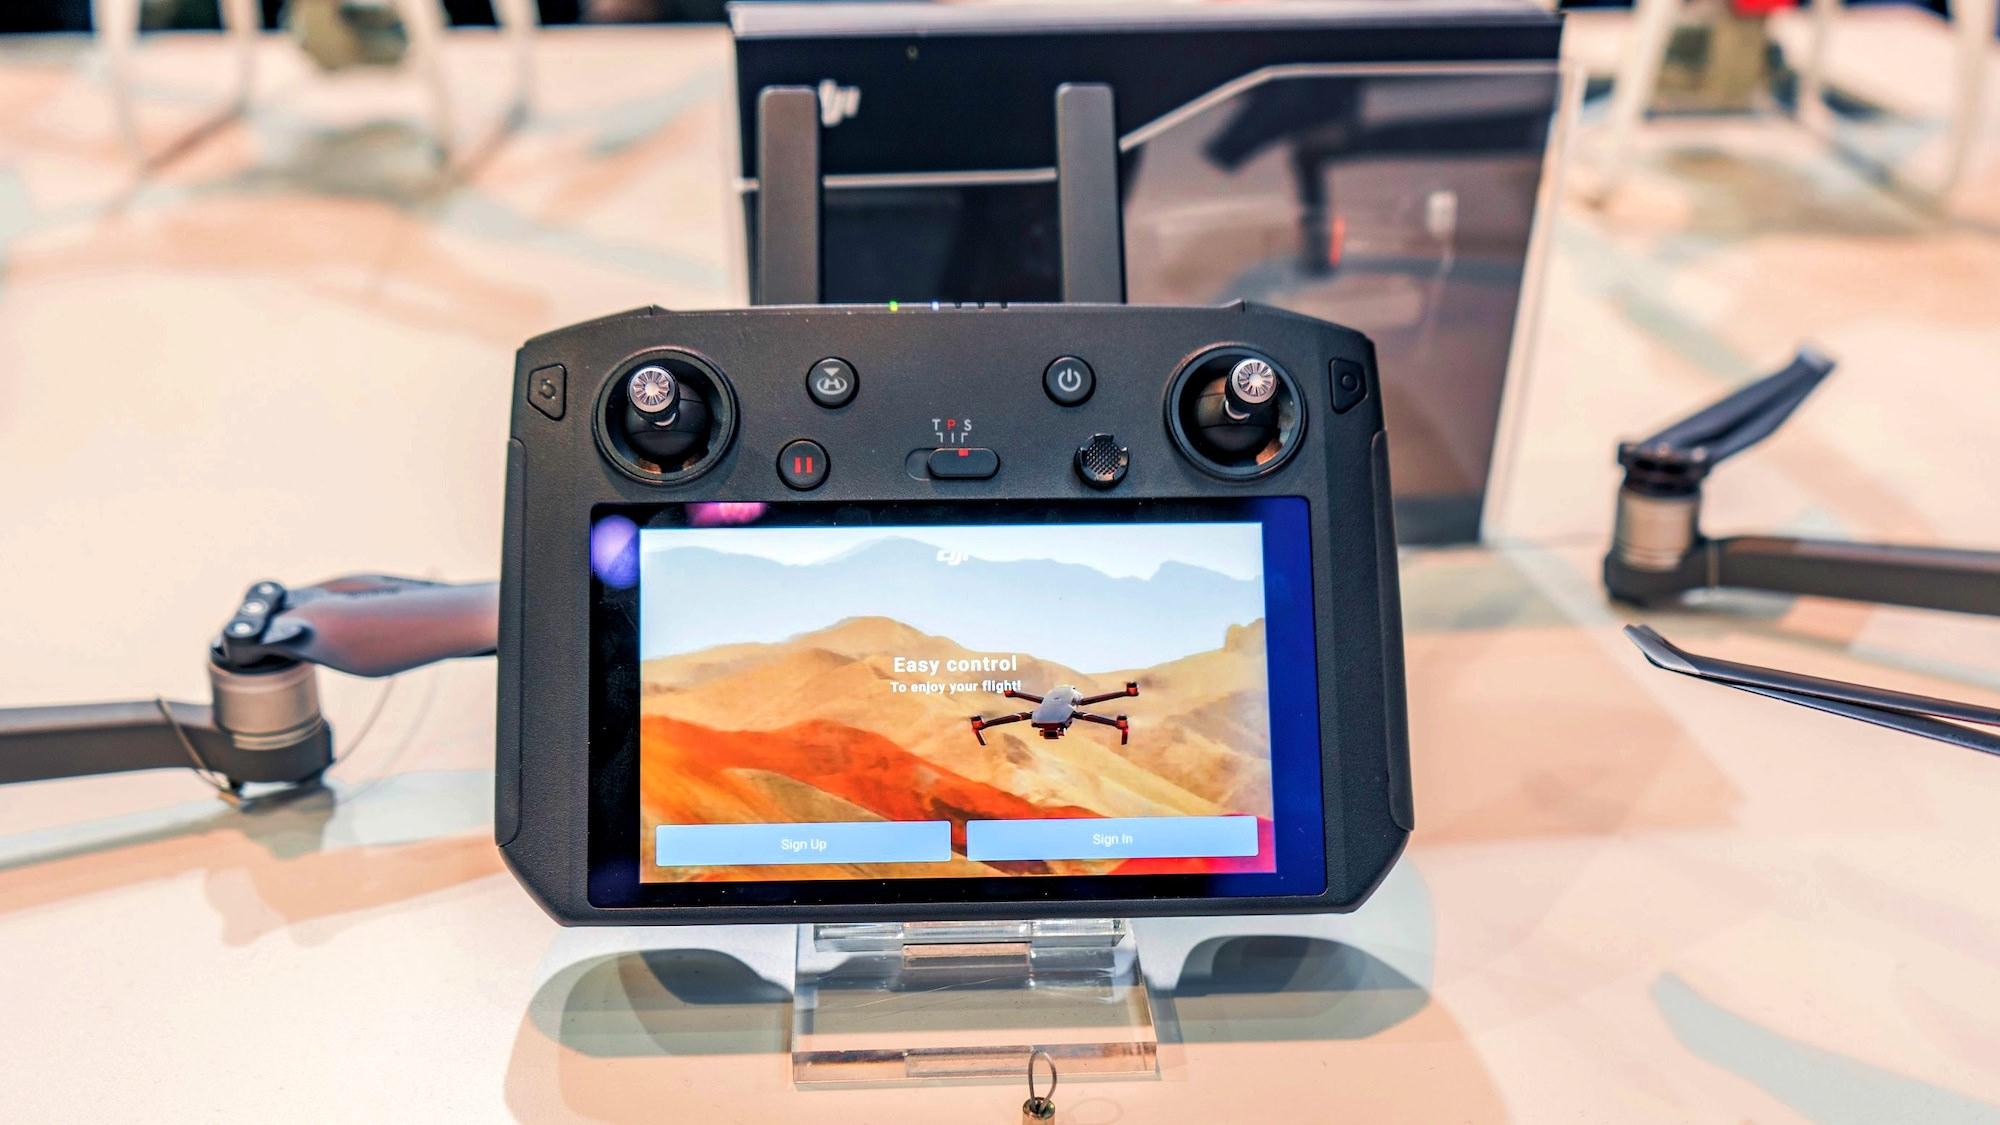 DroneDJ's Best of CES 2019 Awards - DJI Smart Controller